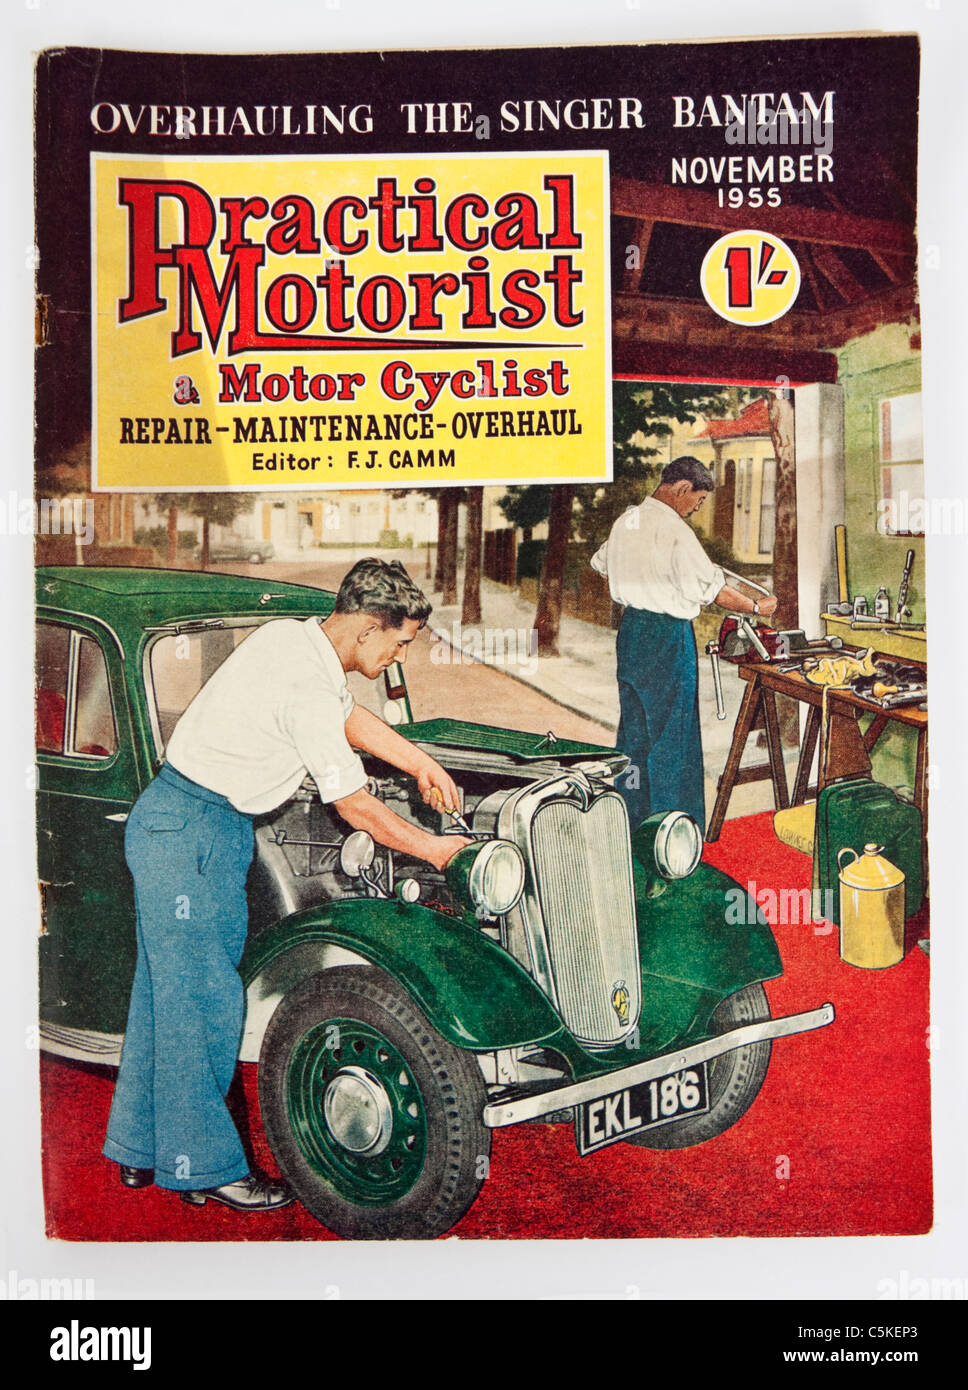 Practical Motorist & Motor Cyclist Magazine from November 1955 - Stock Image